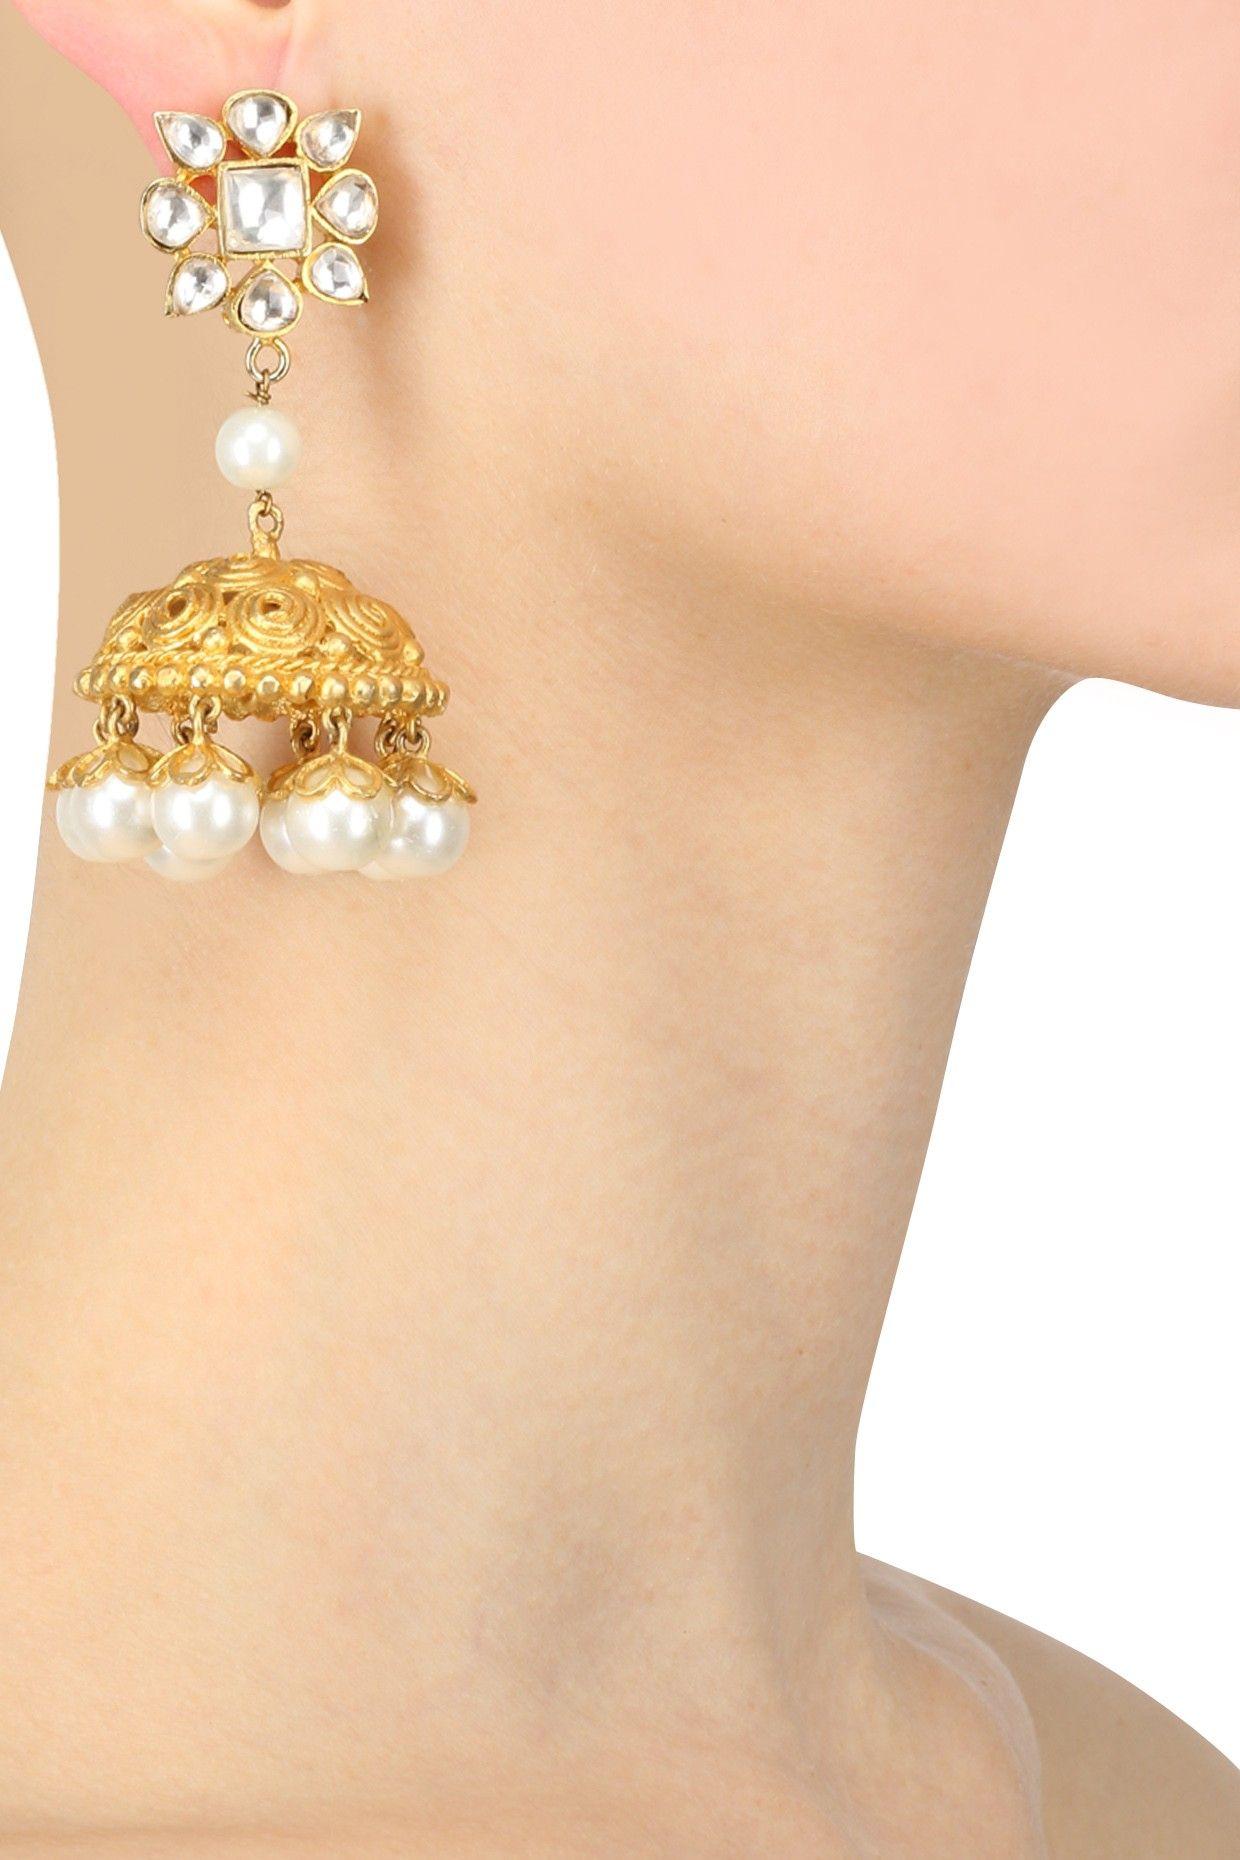 Johara jewels presents Gold finish classic engrave and pearl drop